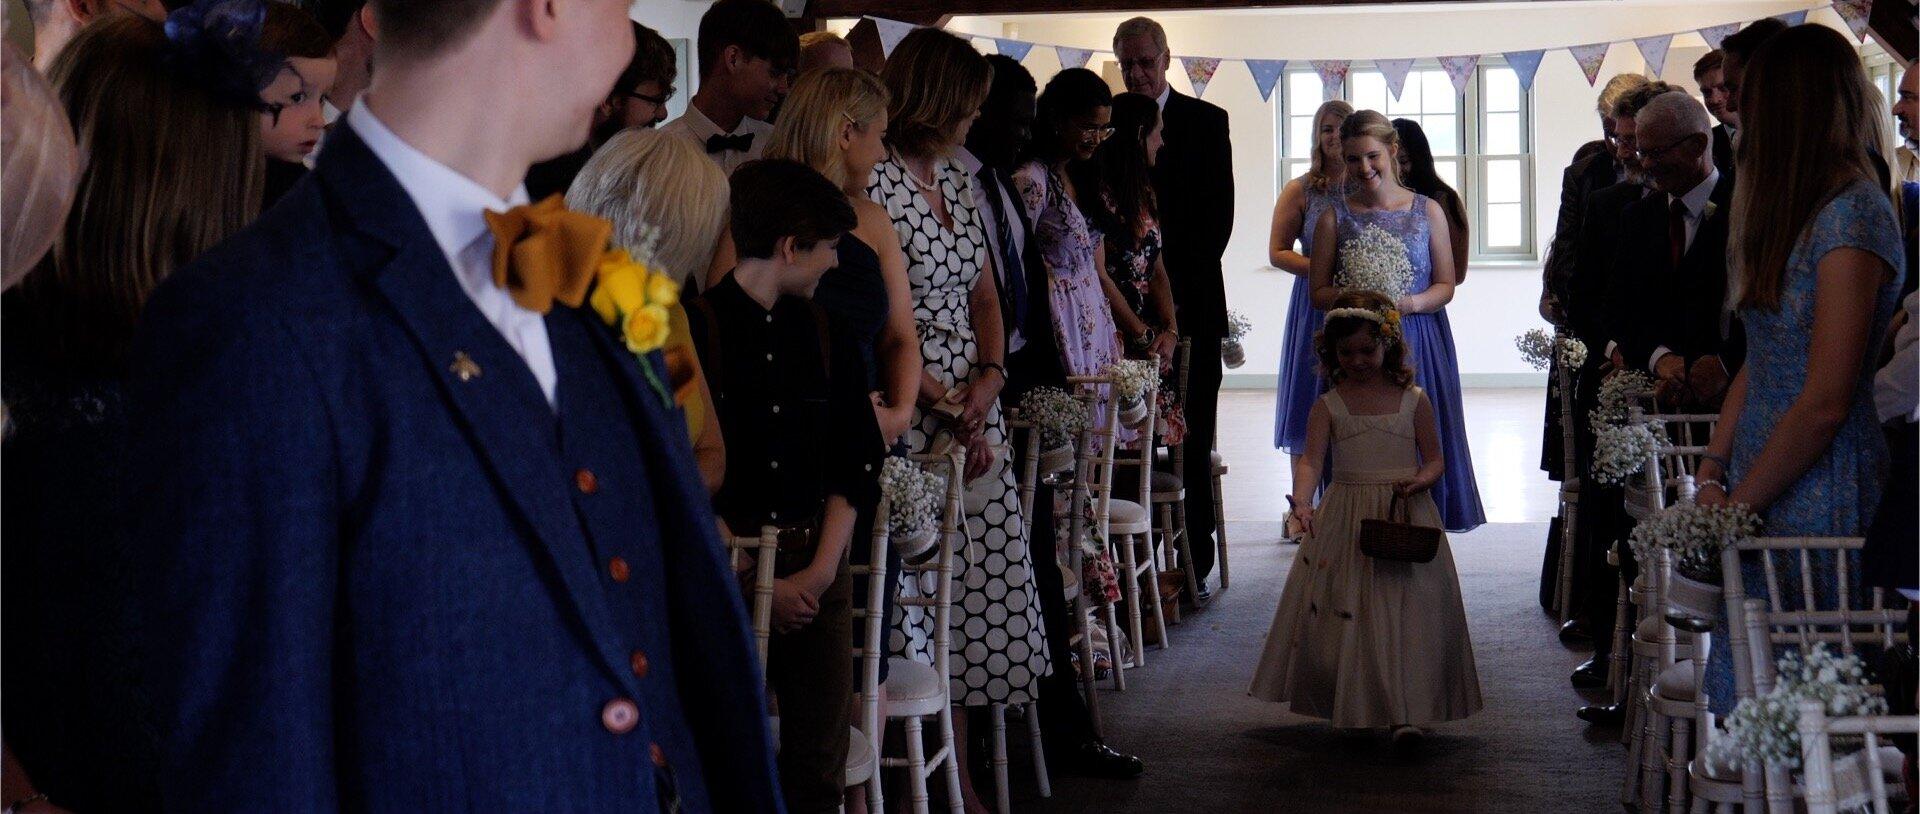 Flower girl at the compasses wedding video.jpg